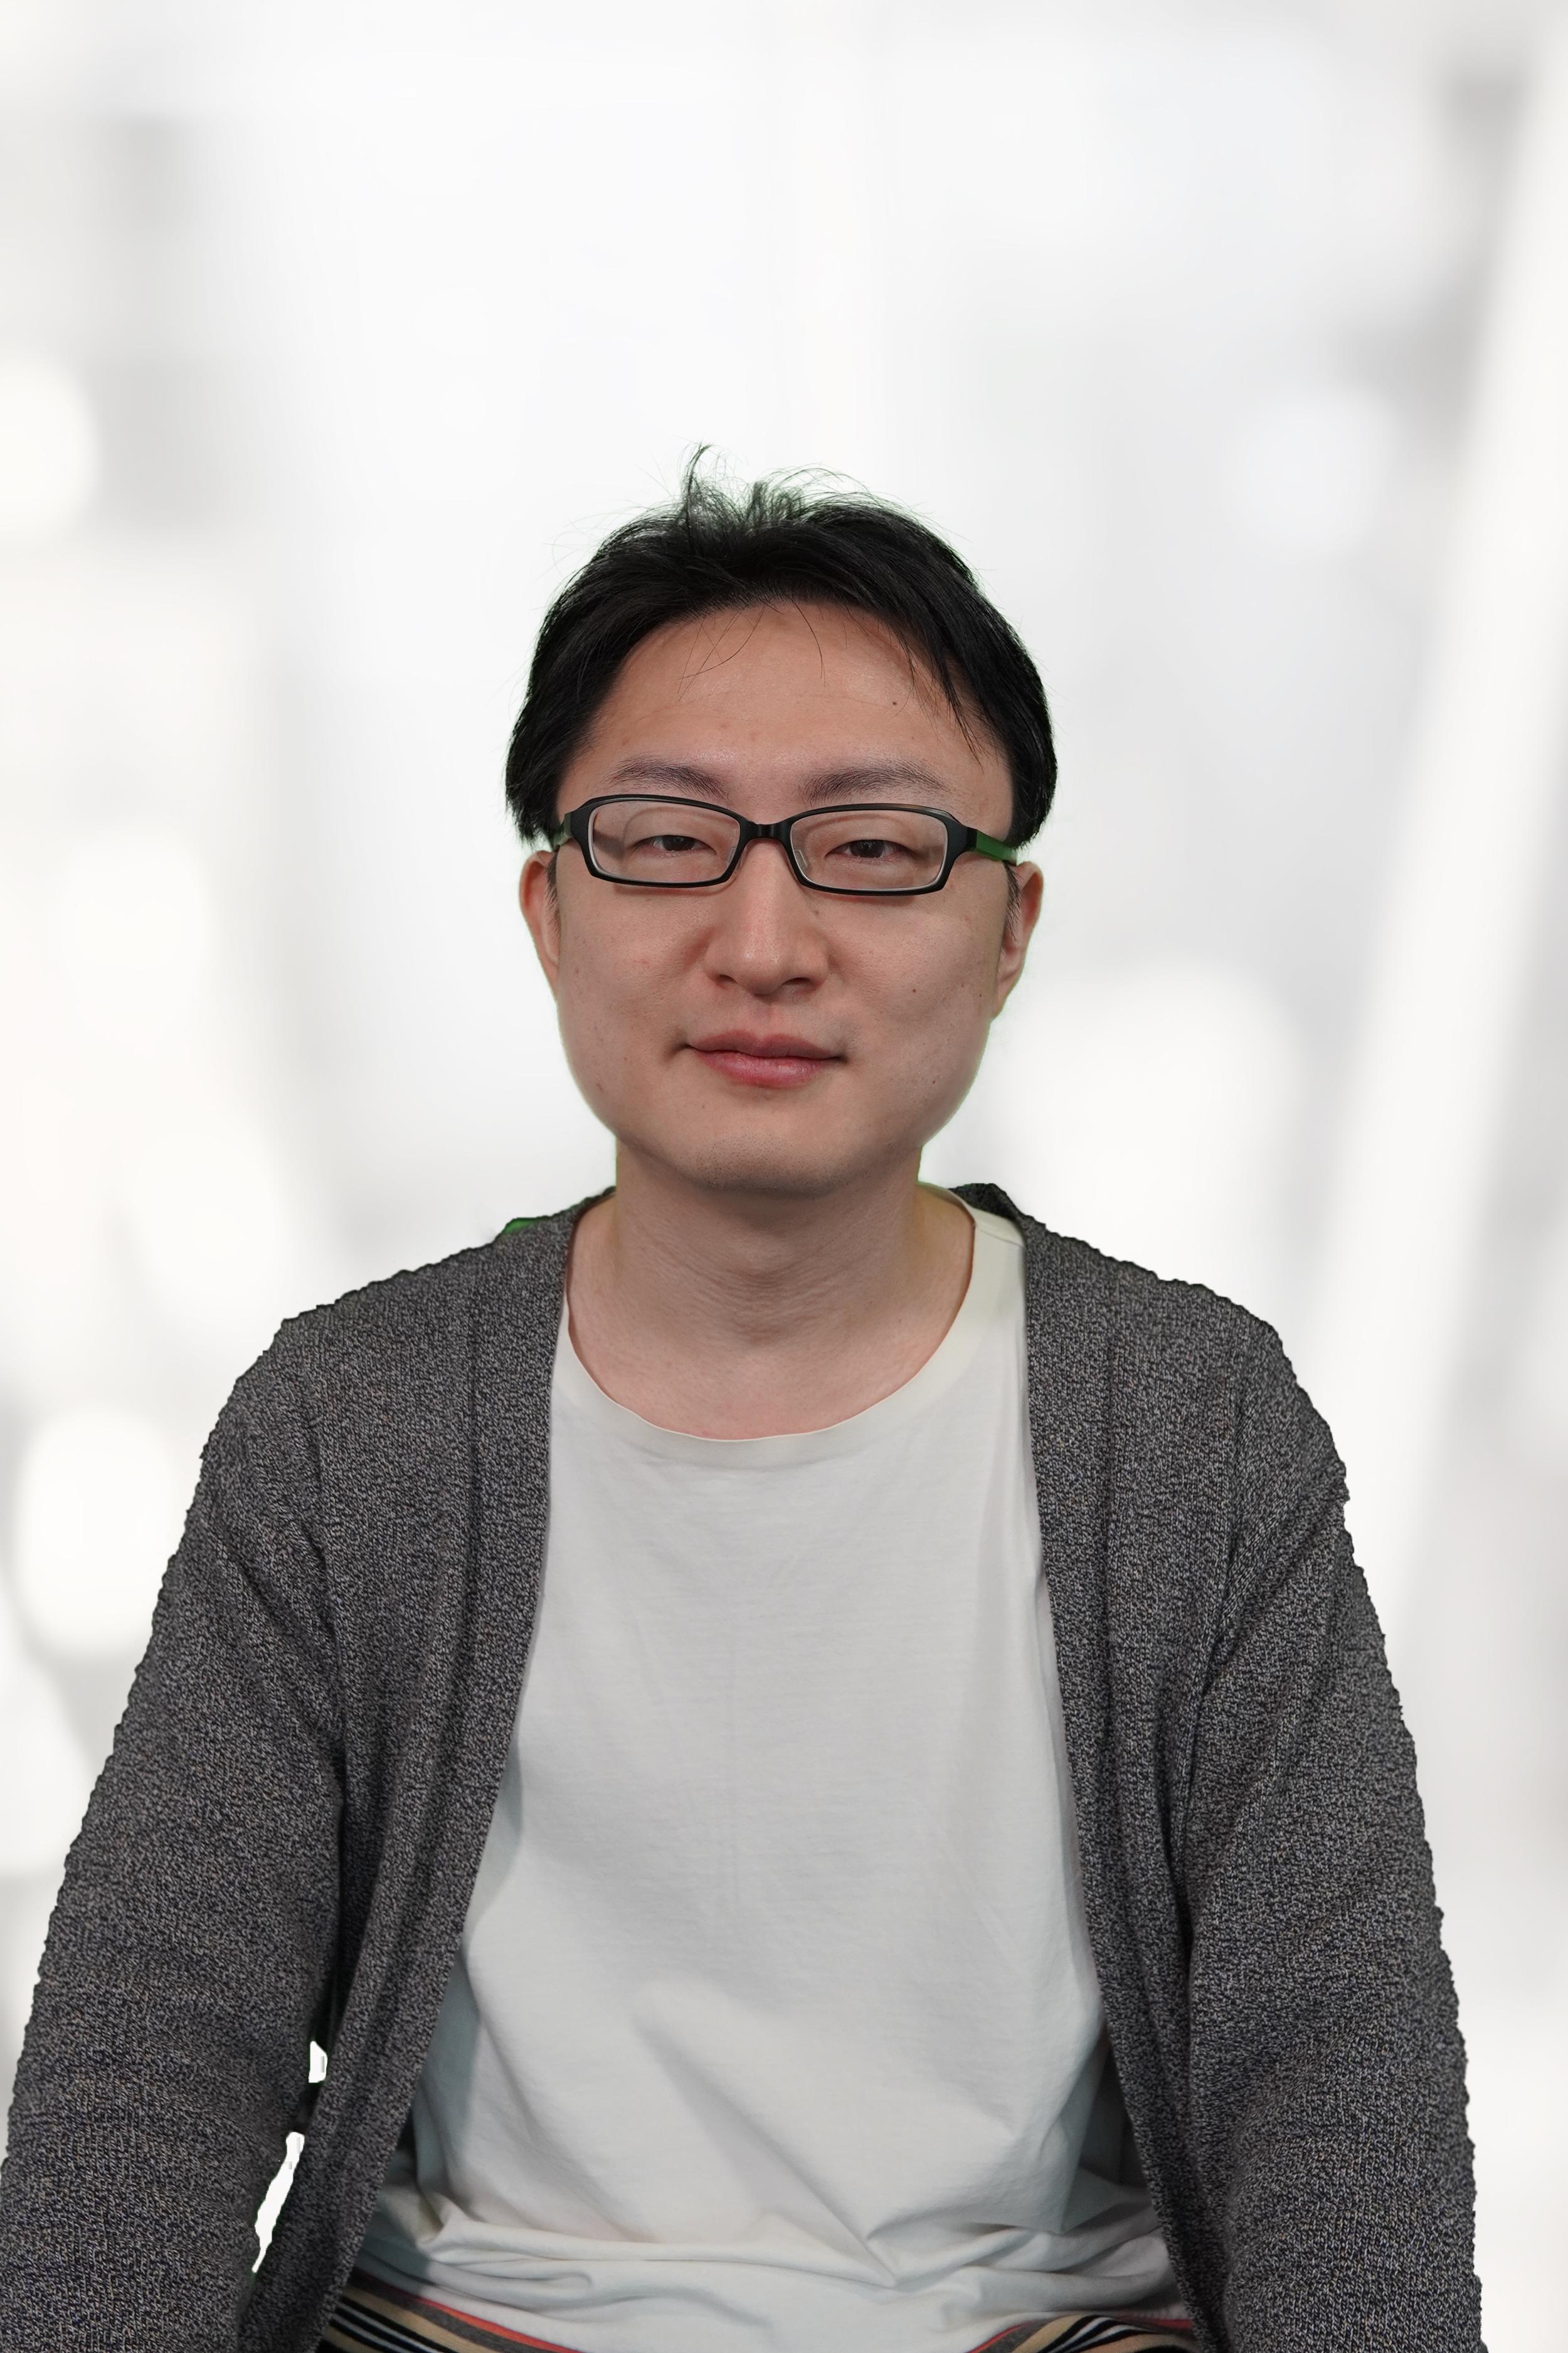 Takuya Kamaguchi